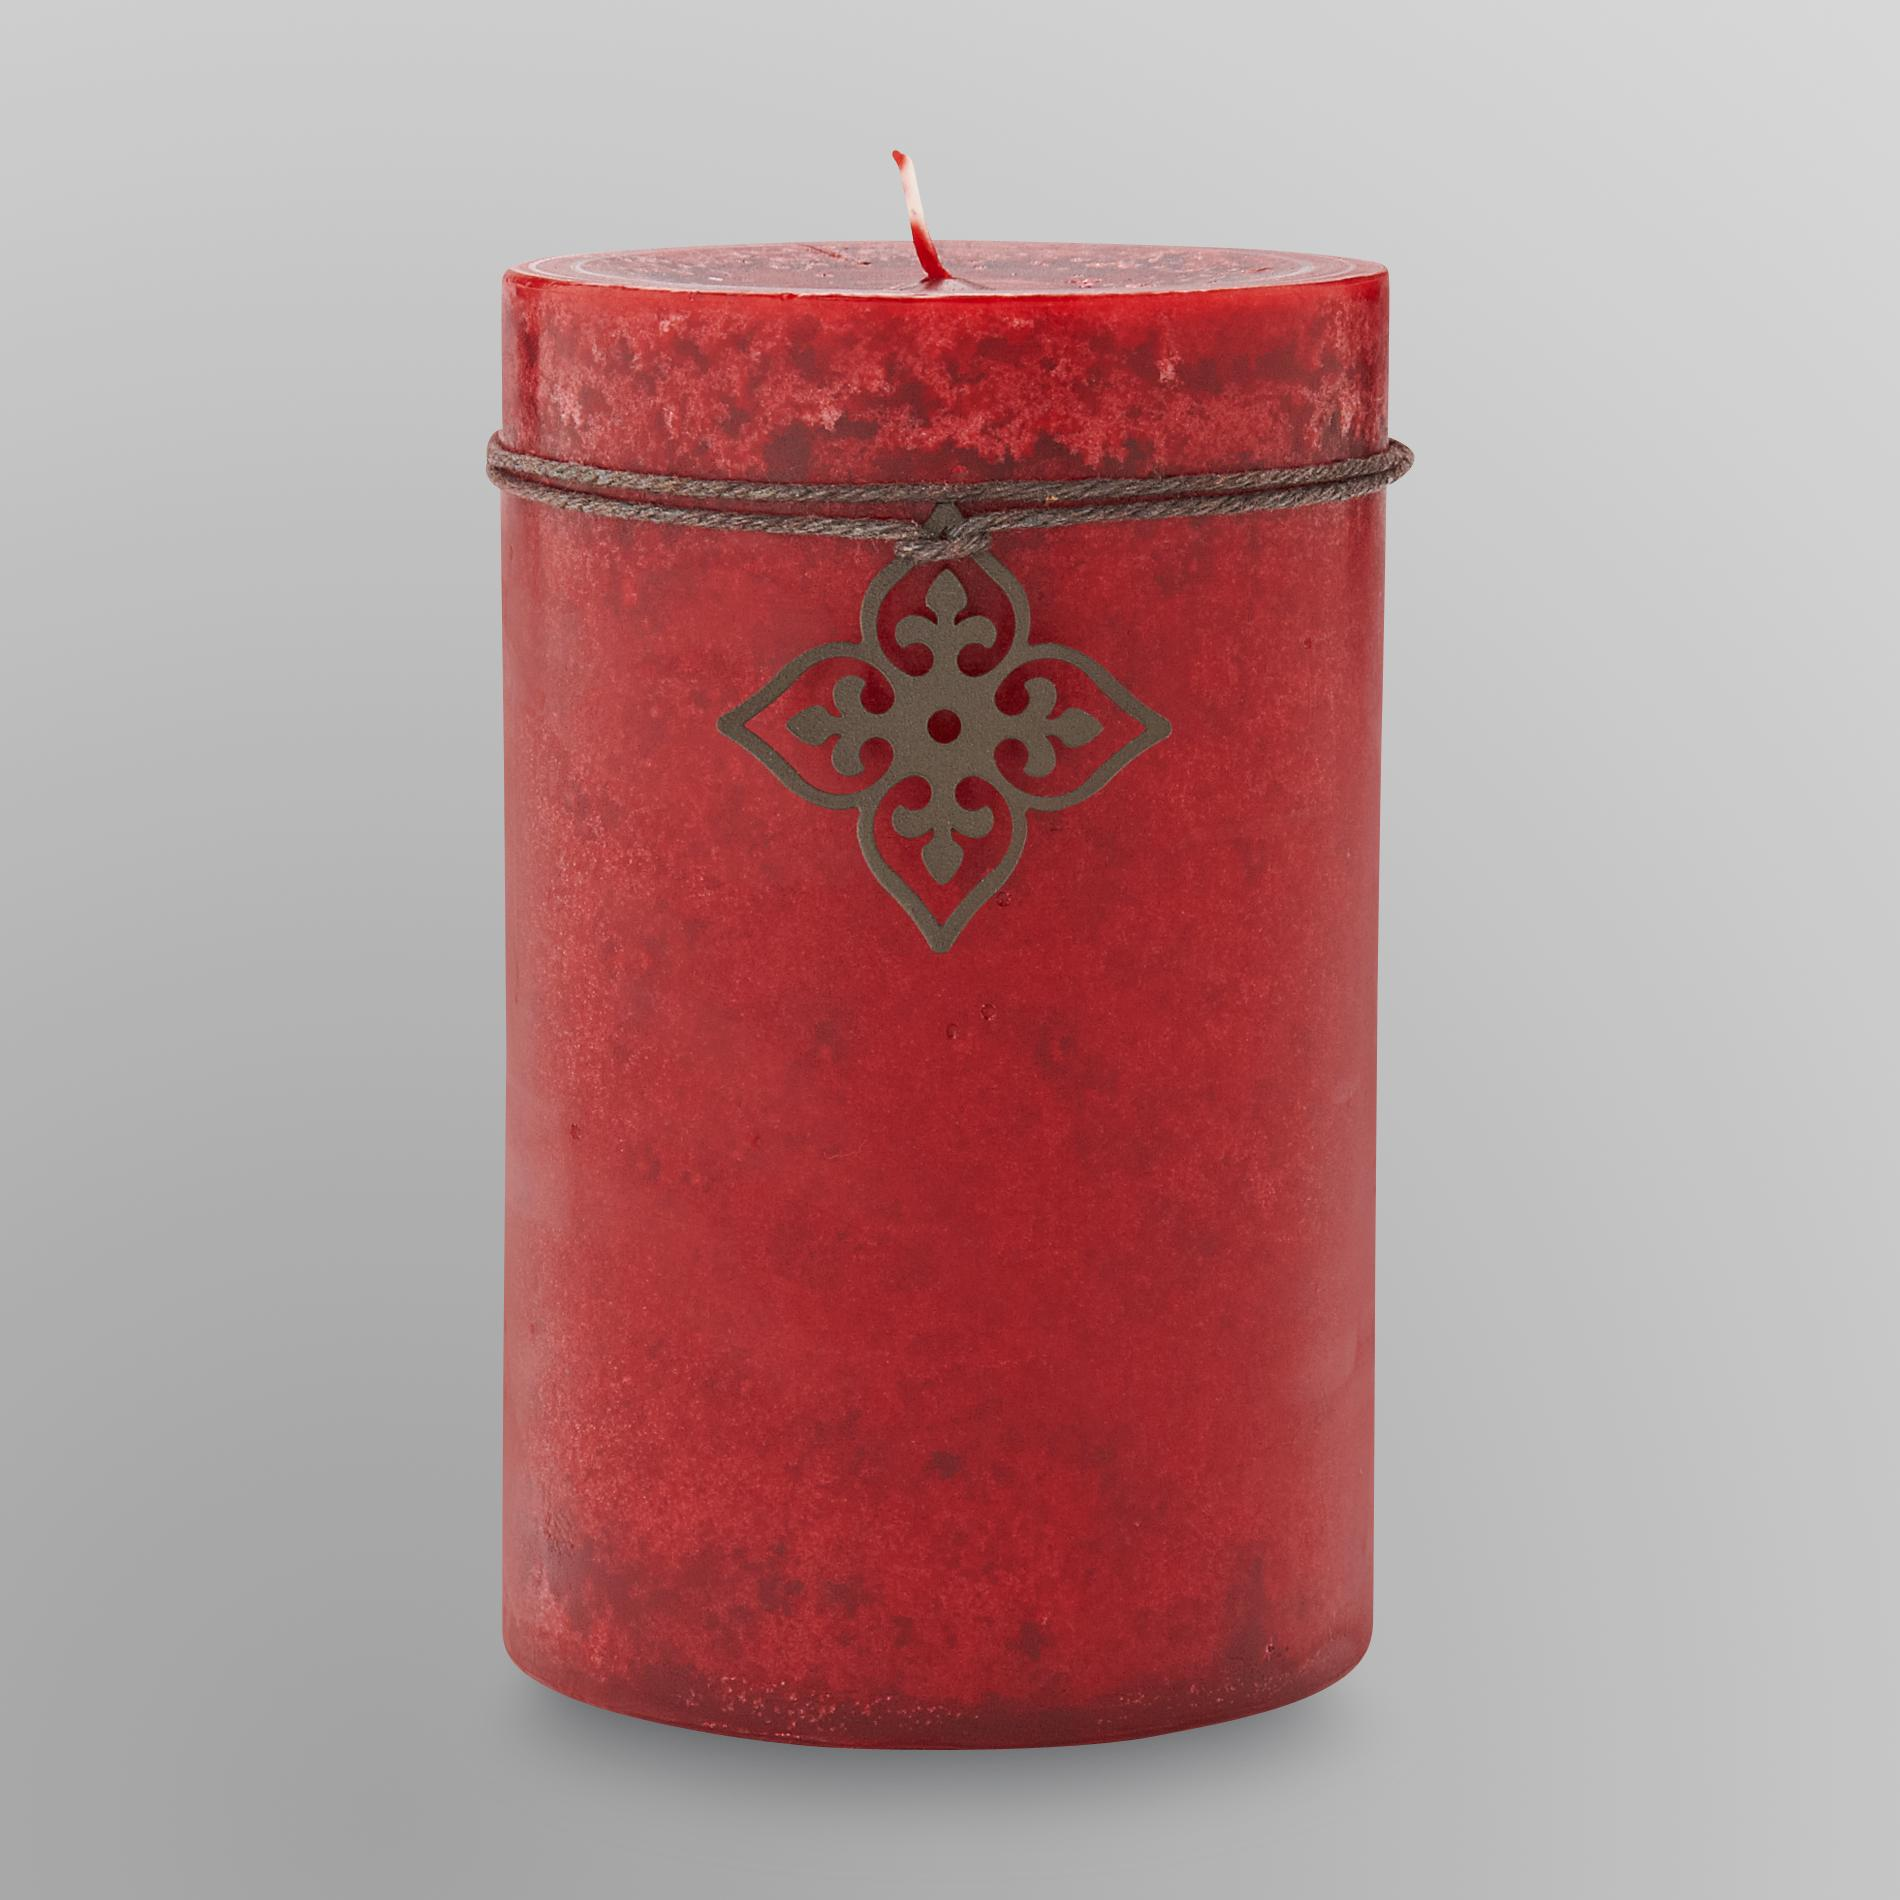 Sandra by Sandra Lee Pillar Candle - Cinnamon Apple & Clove